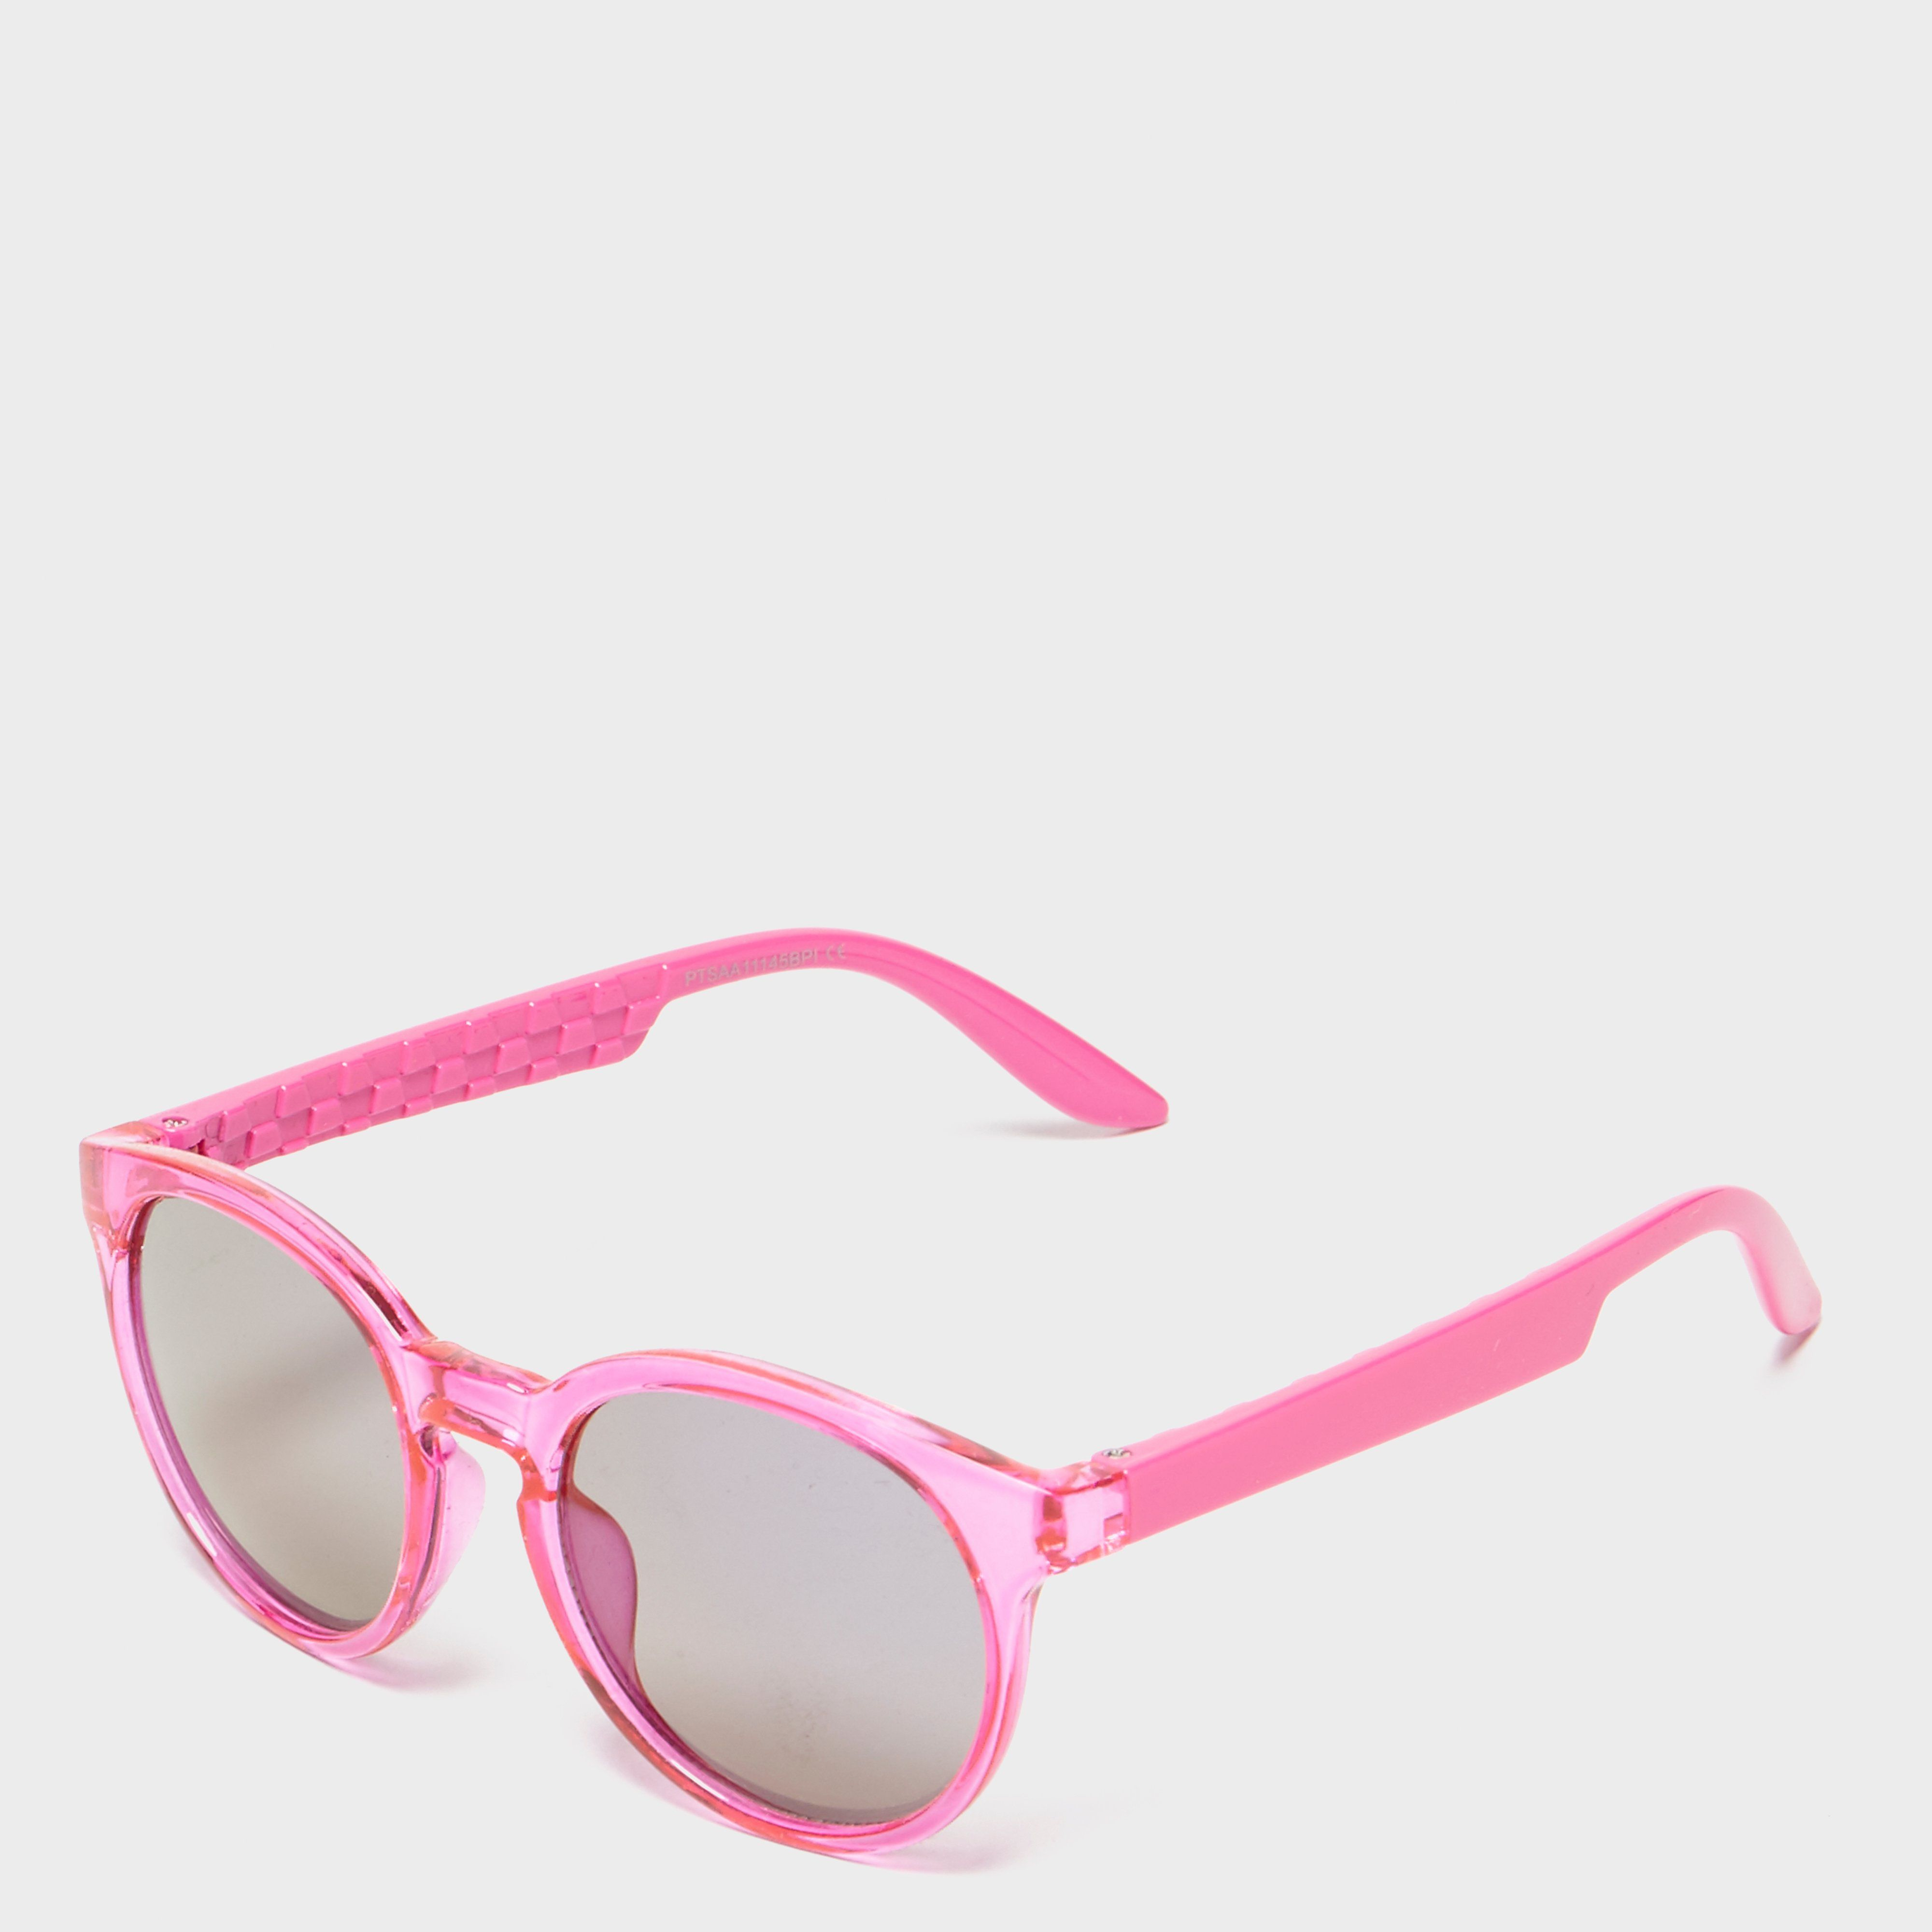 PETER STORM Girls Pink Preppy Sunglasses